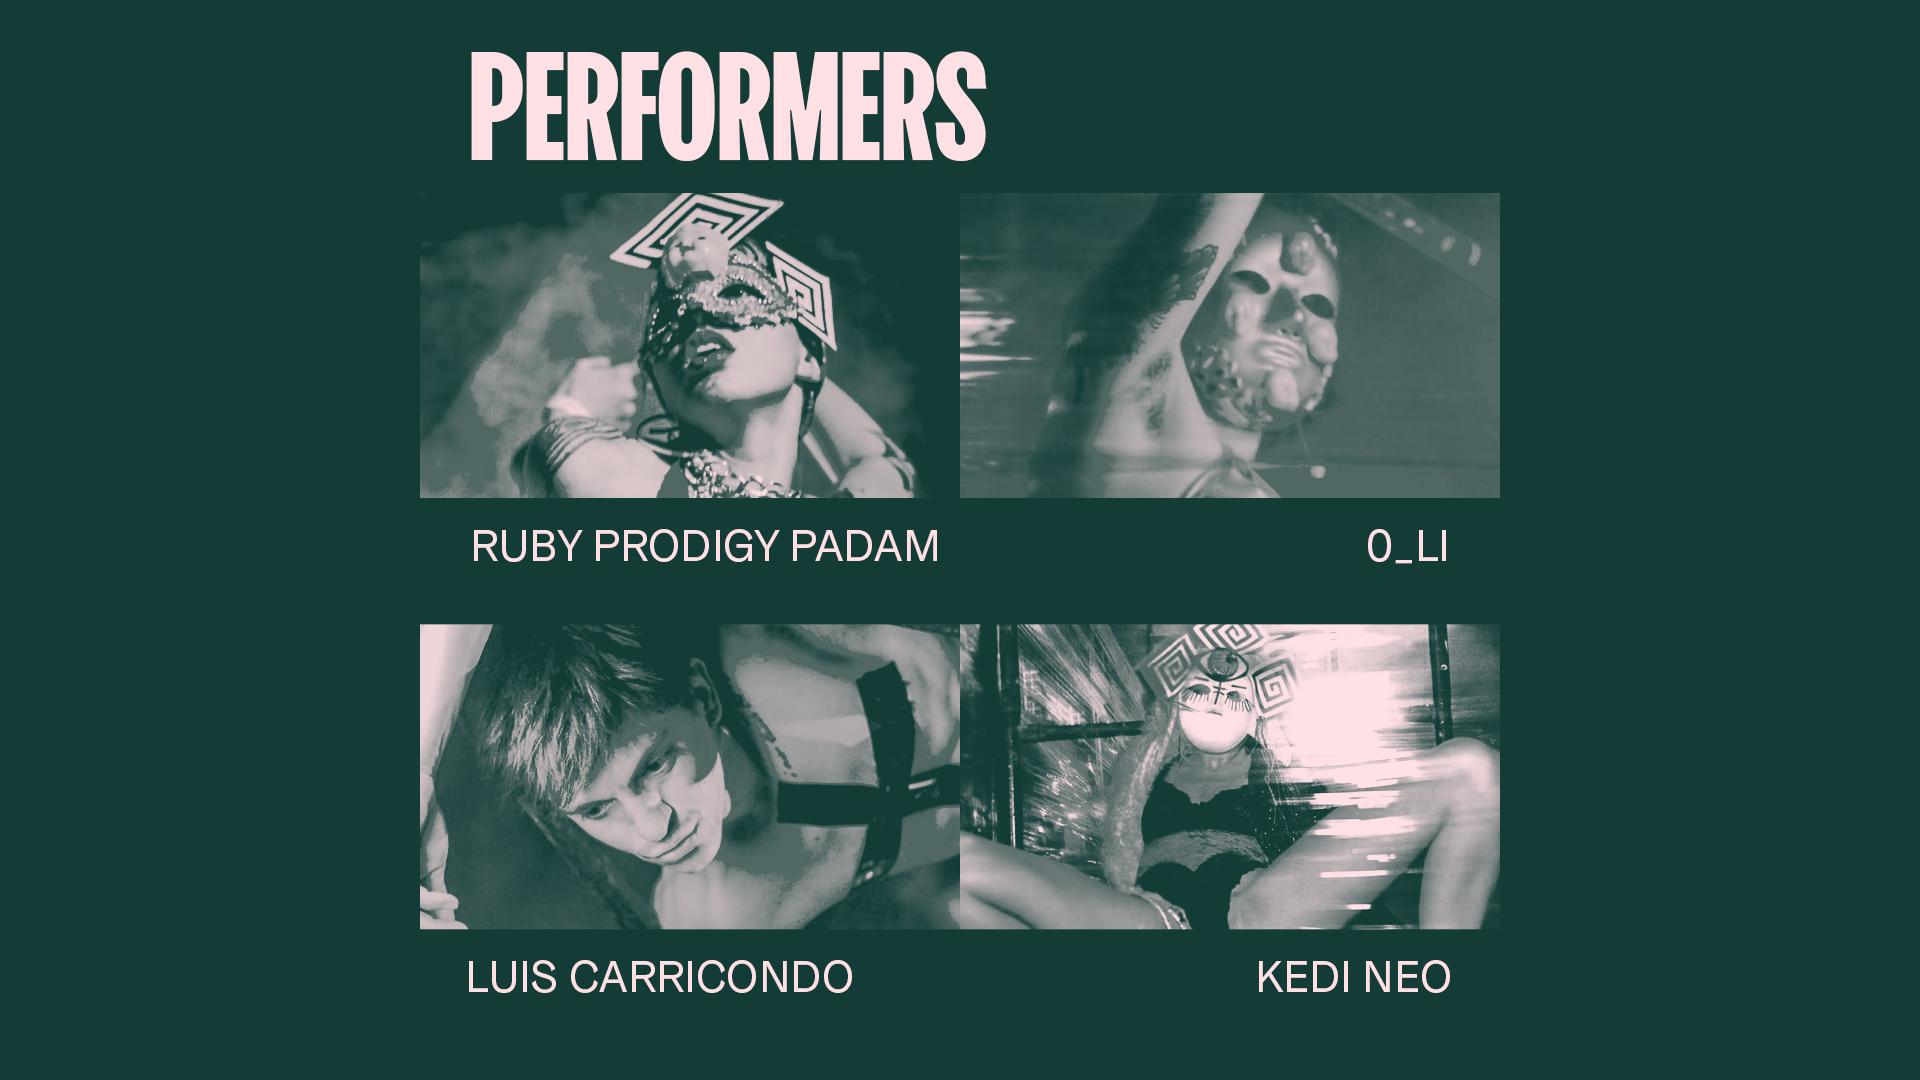 Ruby Prodigy Padam x 0_LI x Luis Carricondo x Kedi Neo (performers)